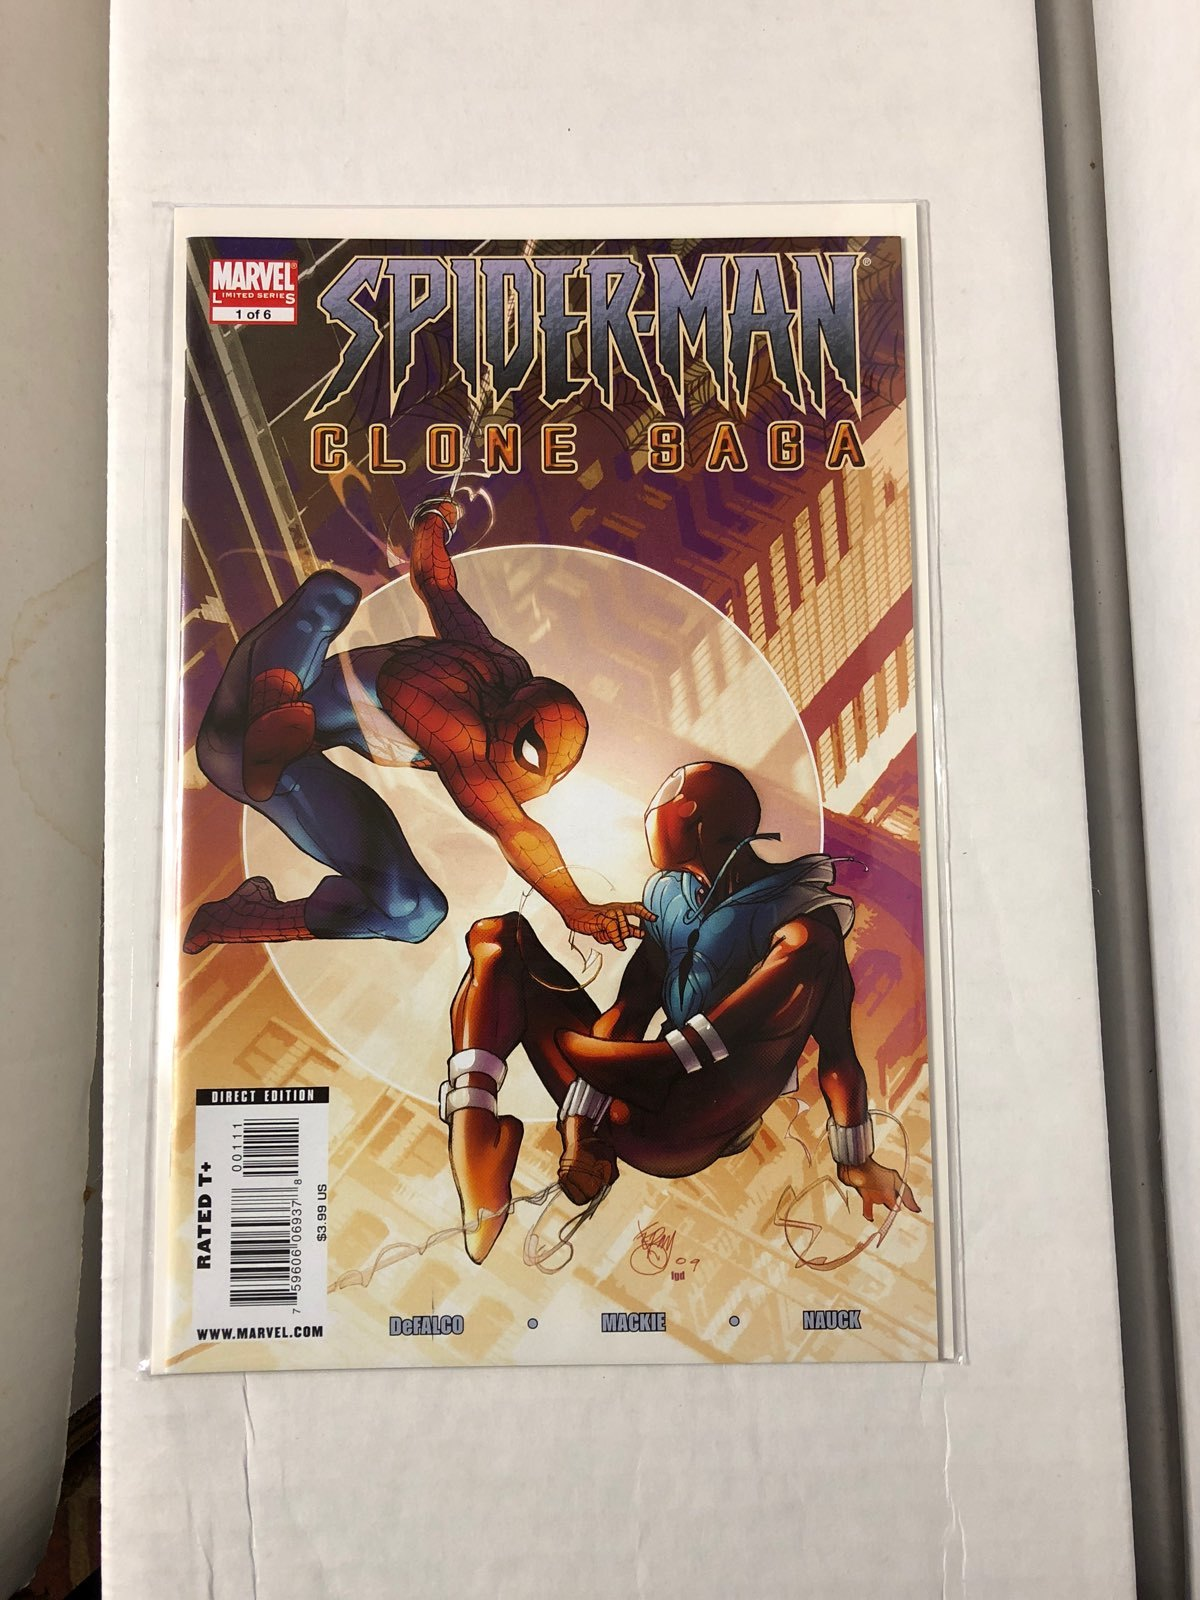 Spider-Man Clone Saga #1